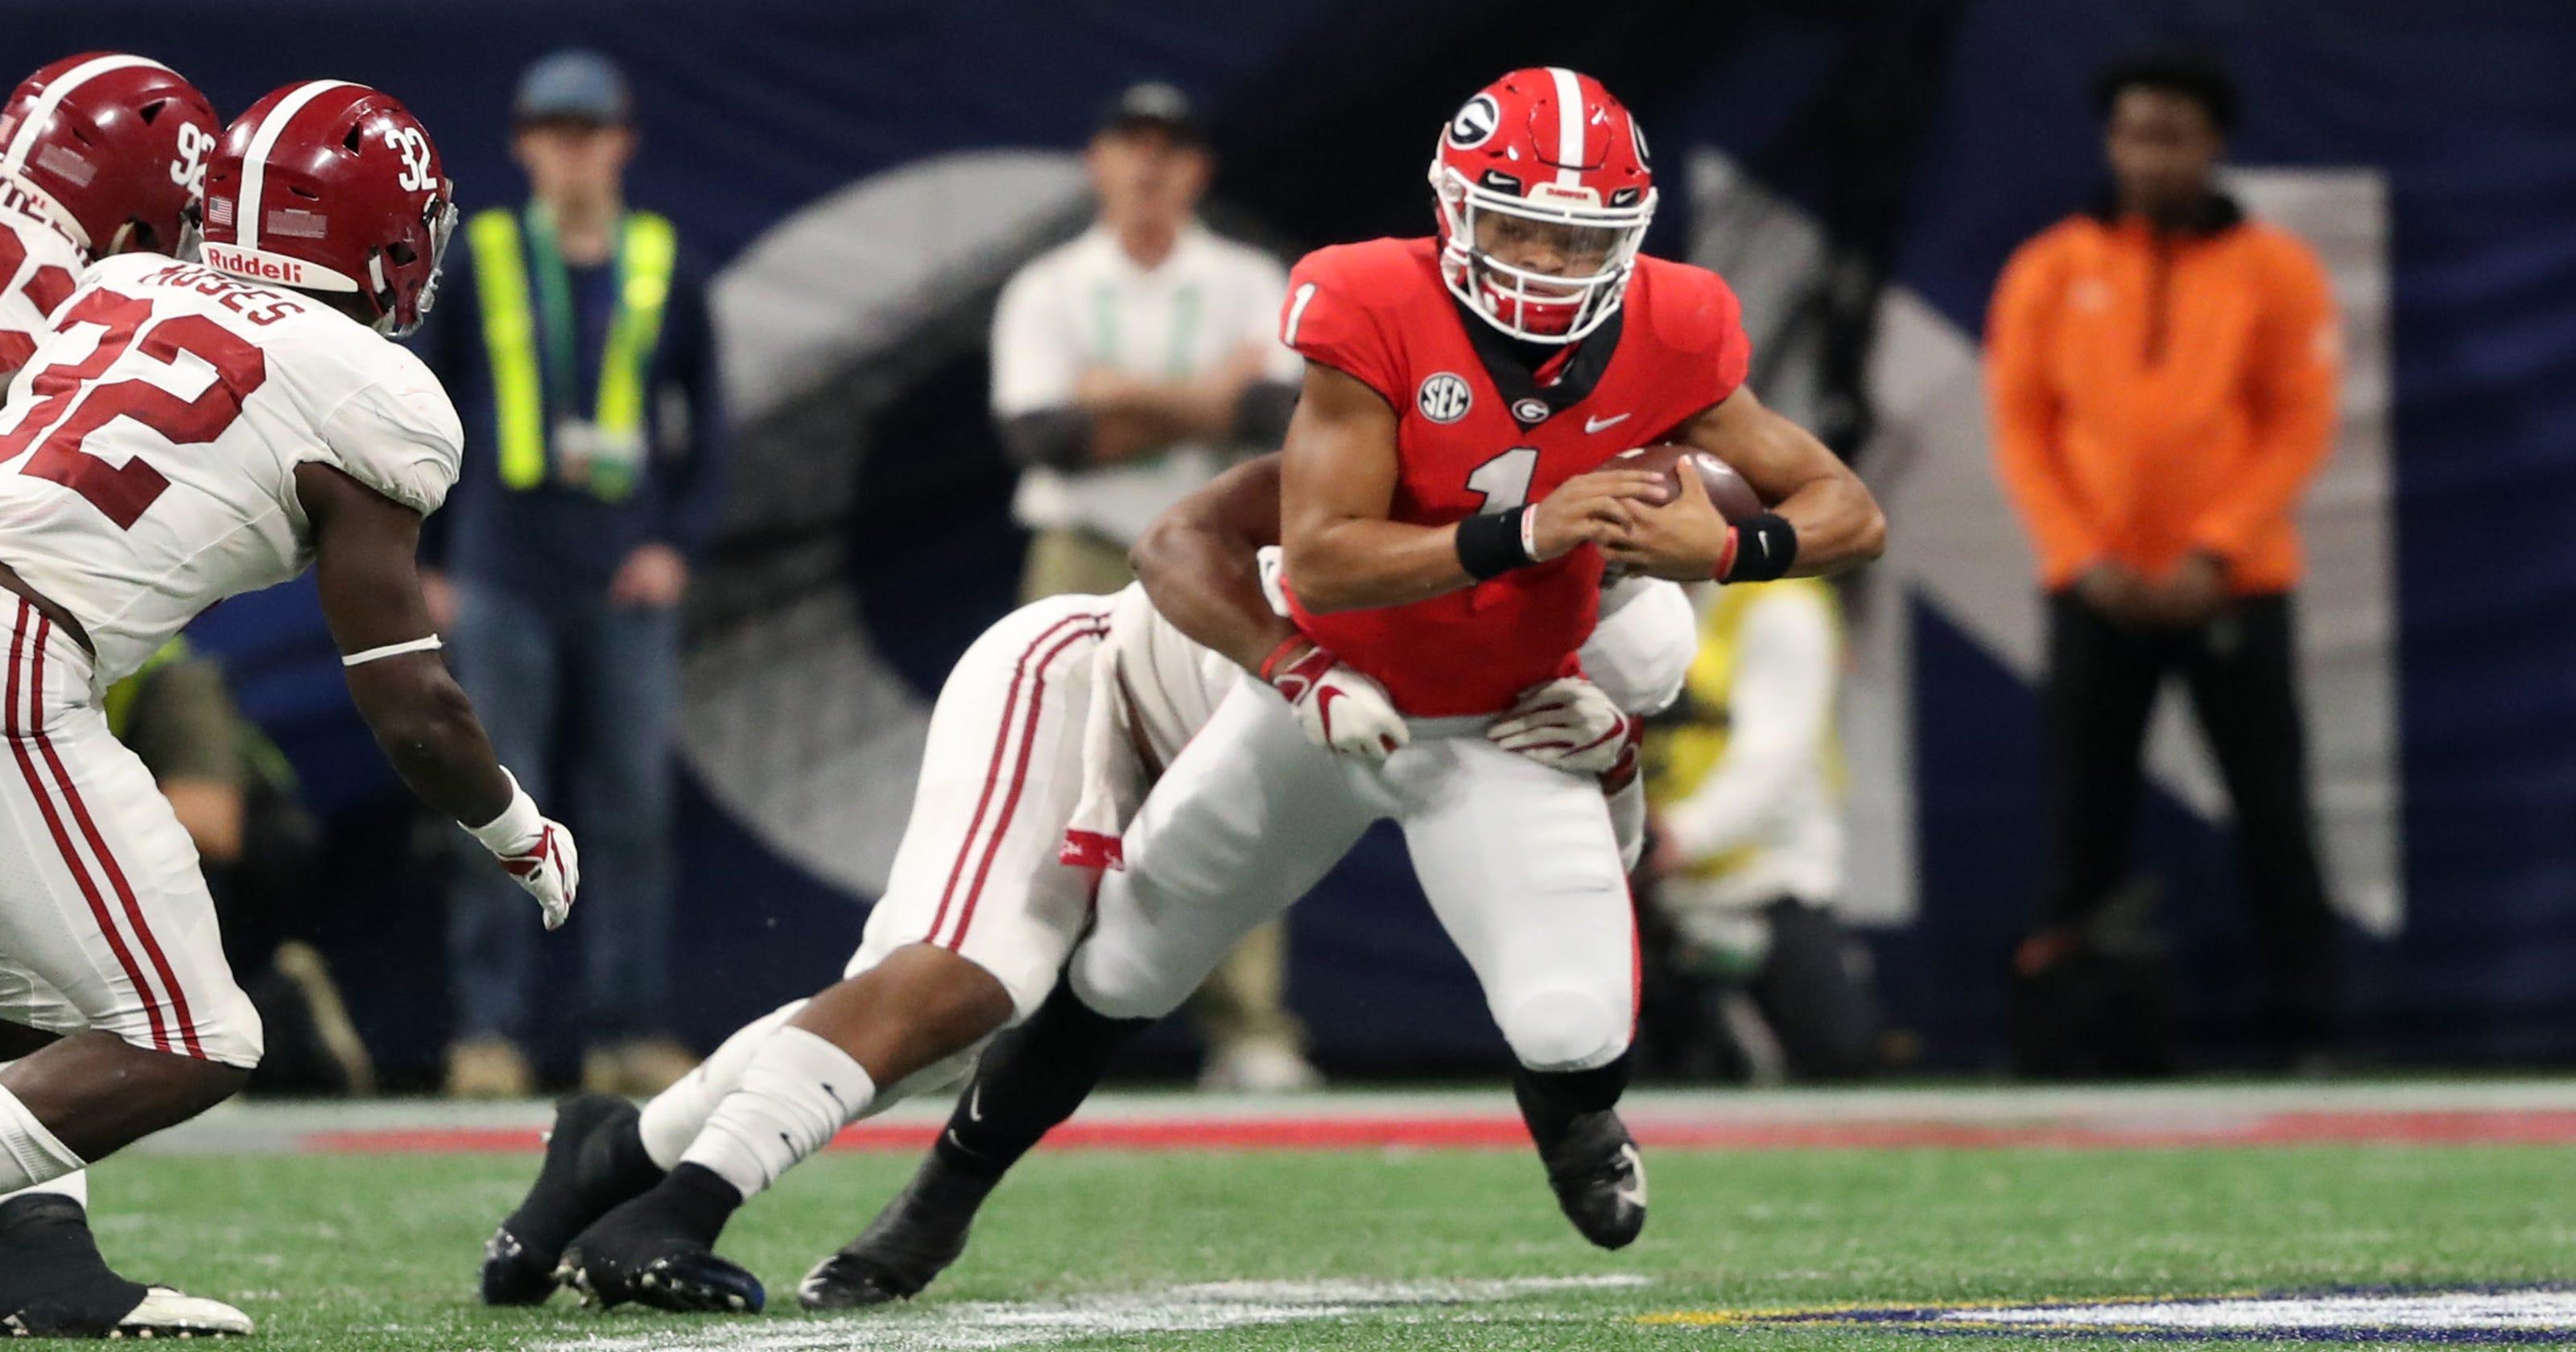 Justin Fields to transfer from Georgia after freshman season